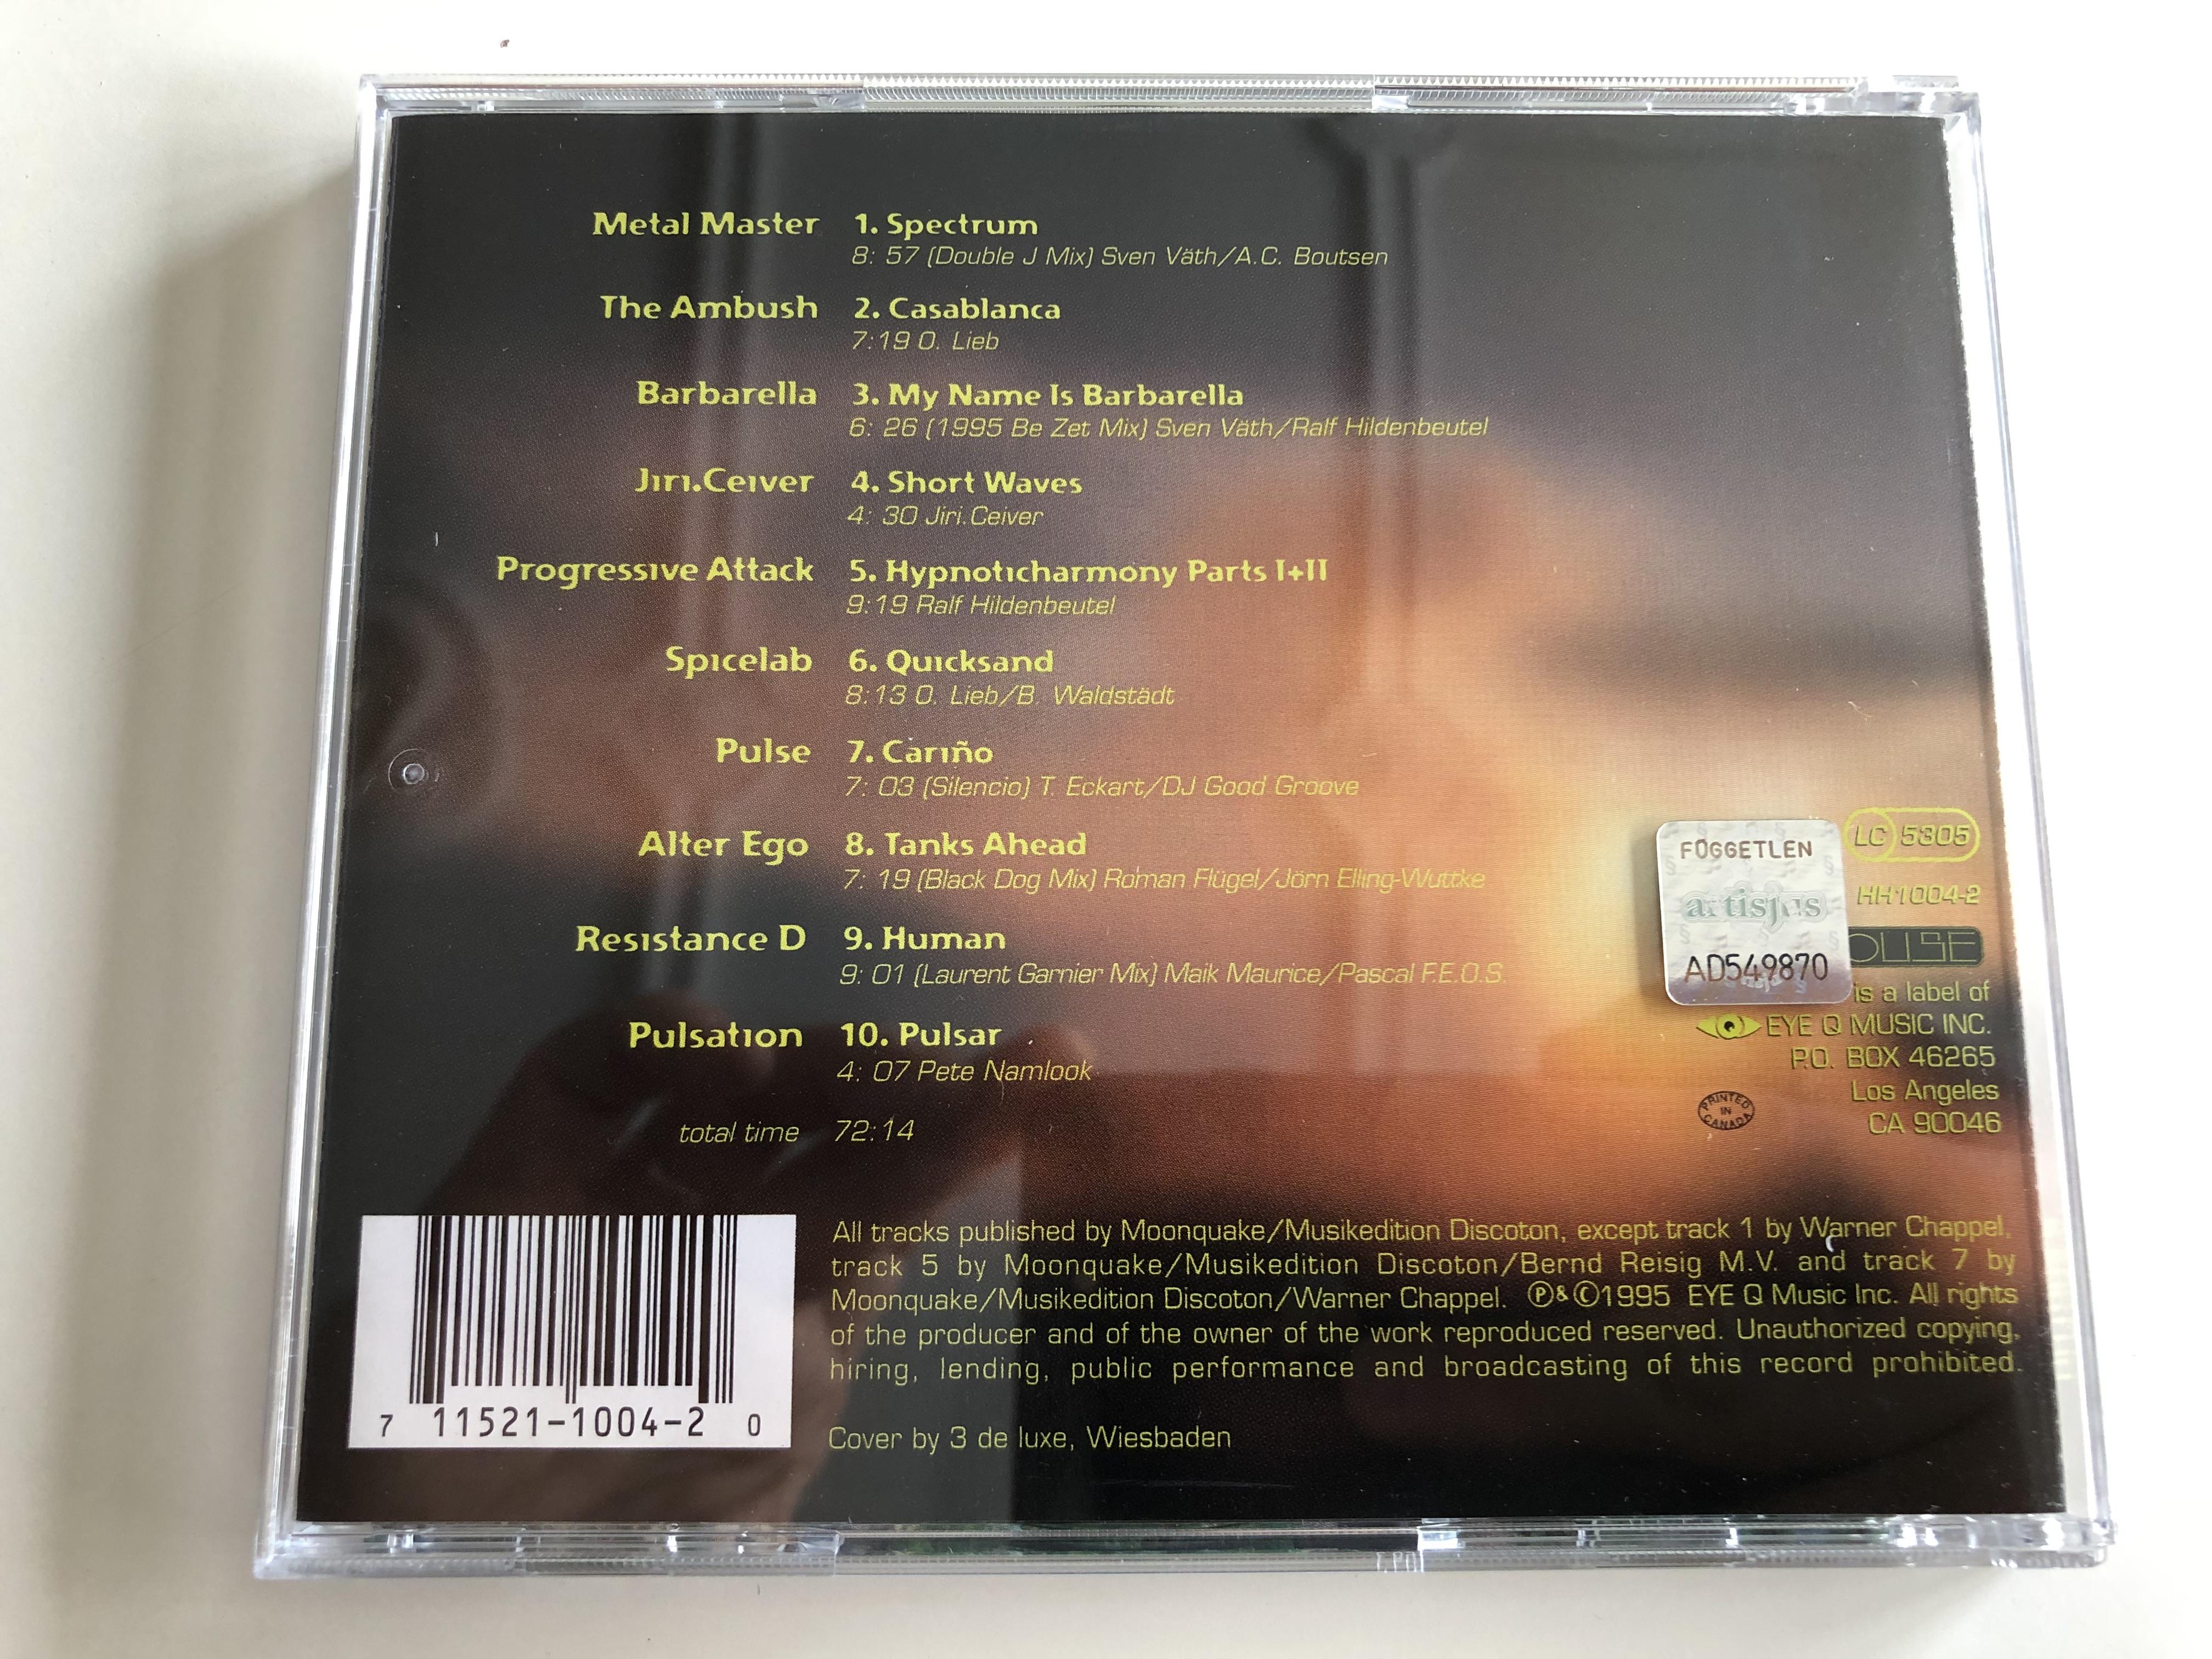 dark-hearts-vol.-1-harthouse-compilation-metal-master-the-ambush-barbarella-progressive-attack-spicelab-alter-ego-audio-cd-1995-hh-1004-2-5-.jpg